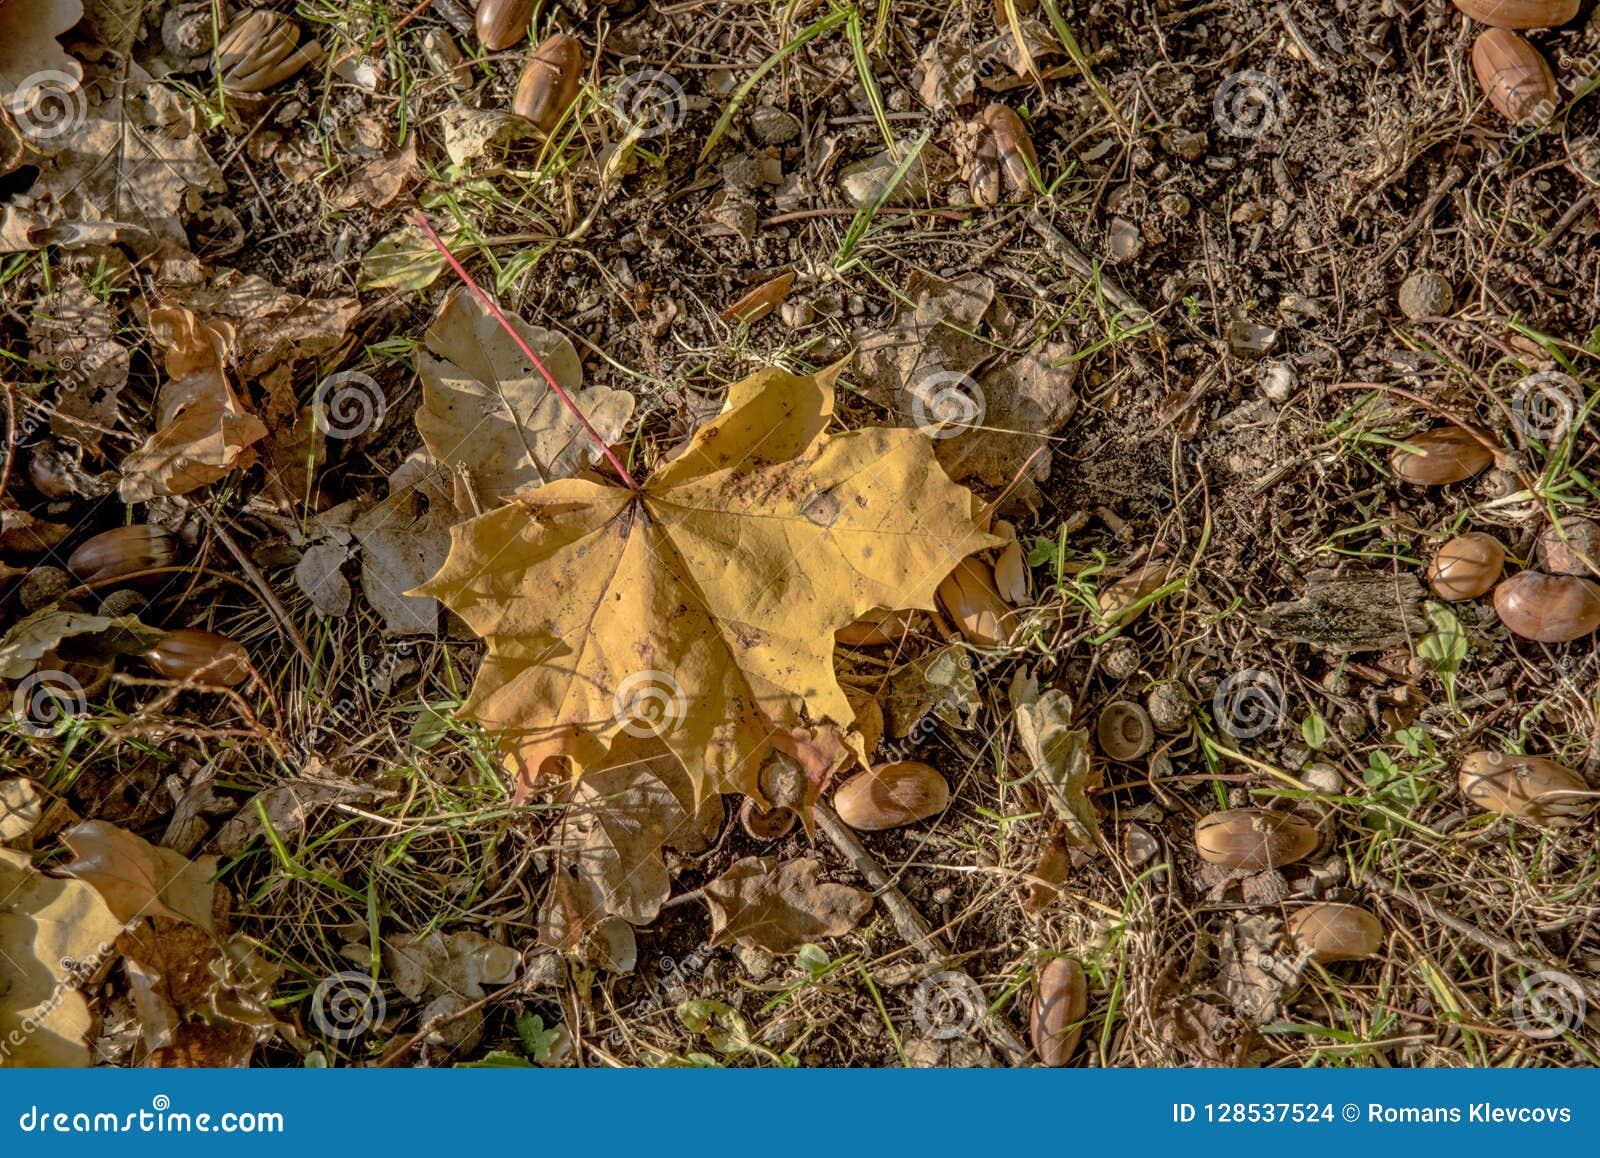 Autumn leaves and acorn. Abstract autumn texture